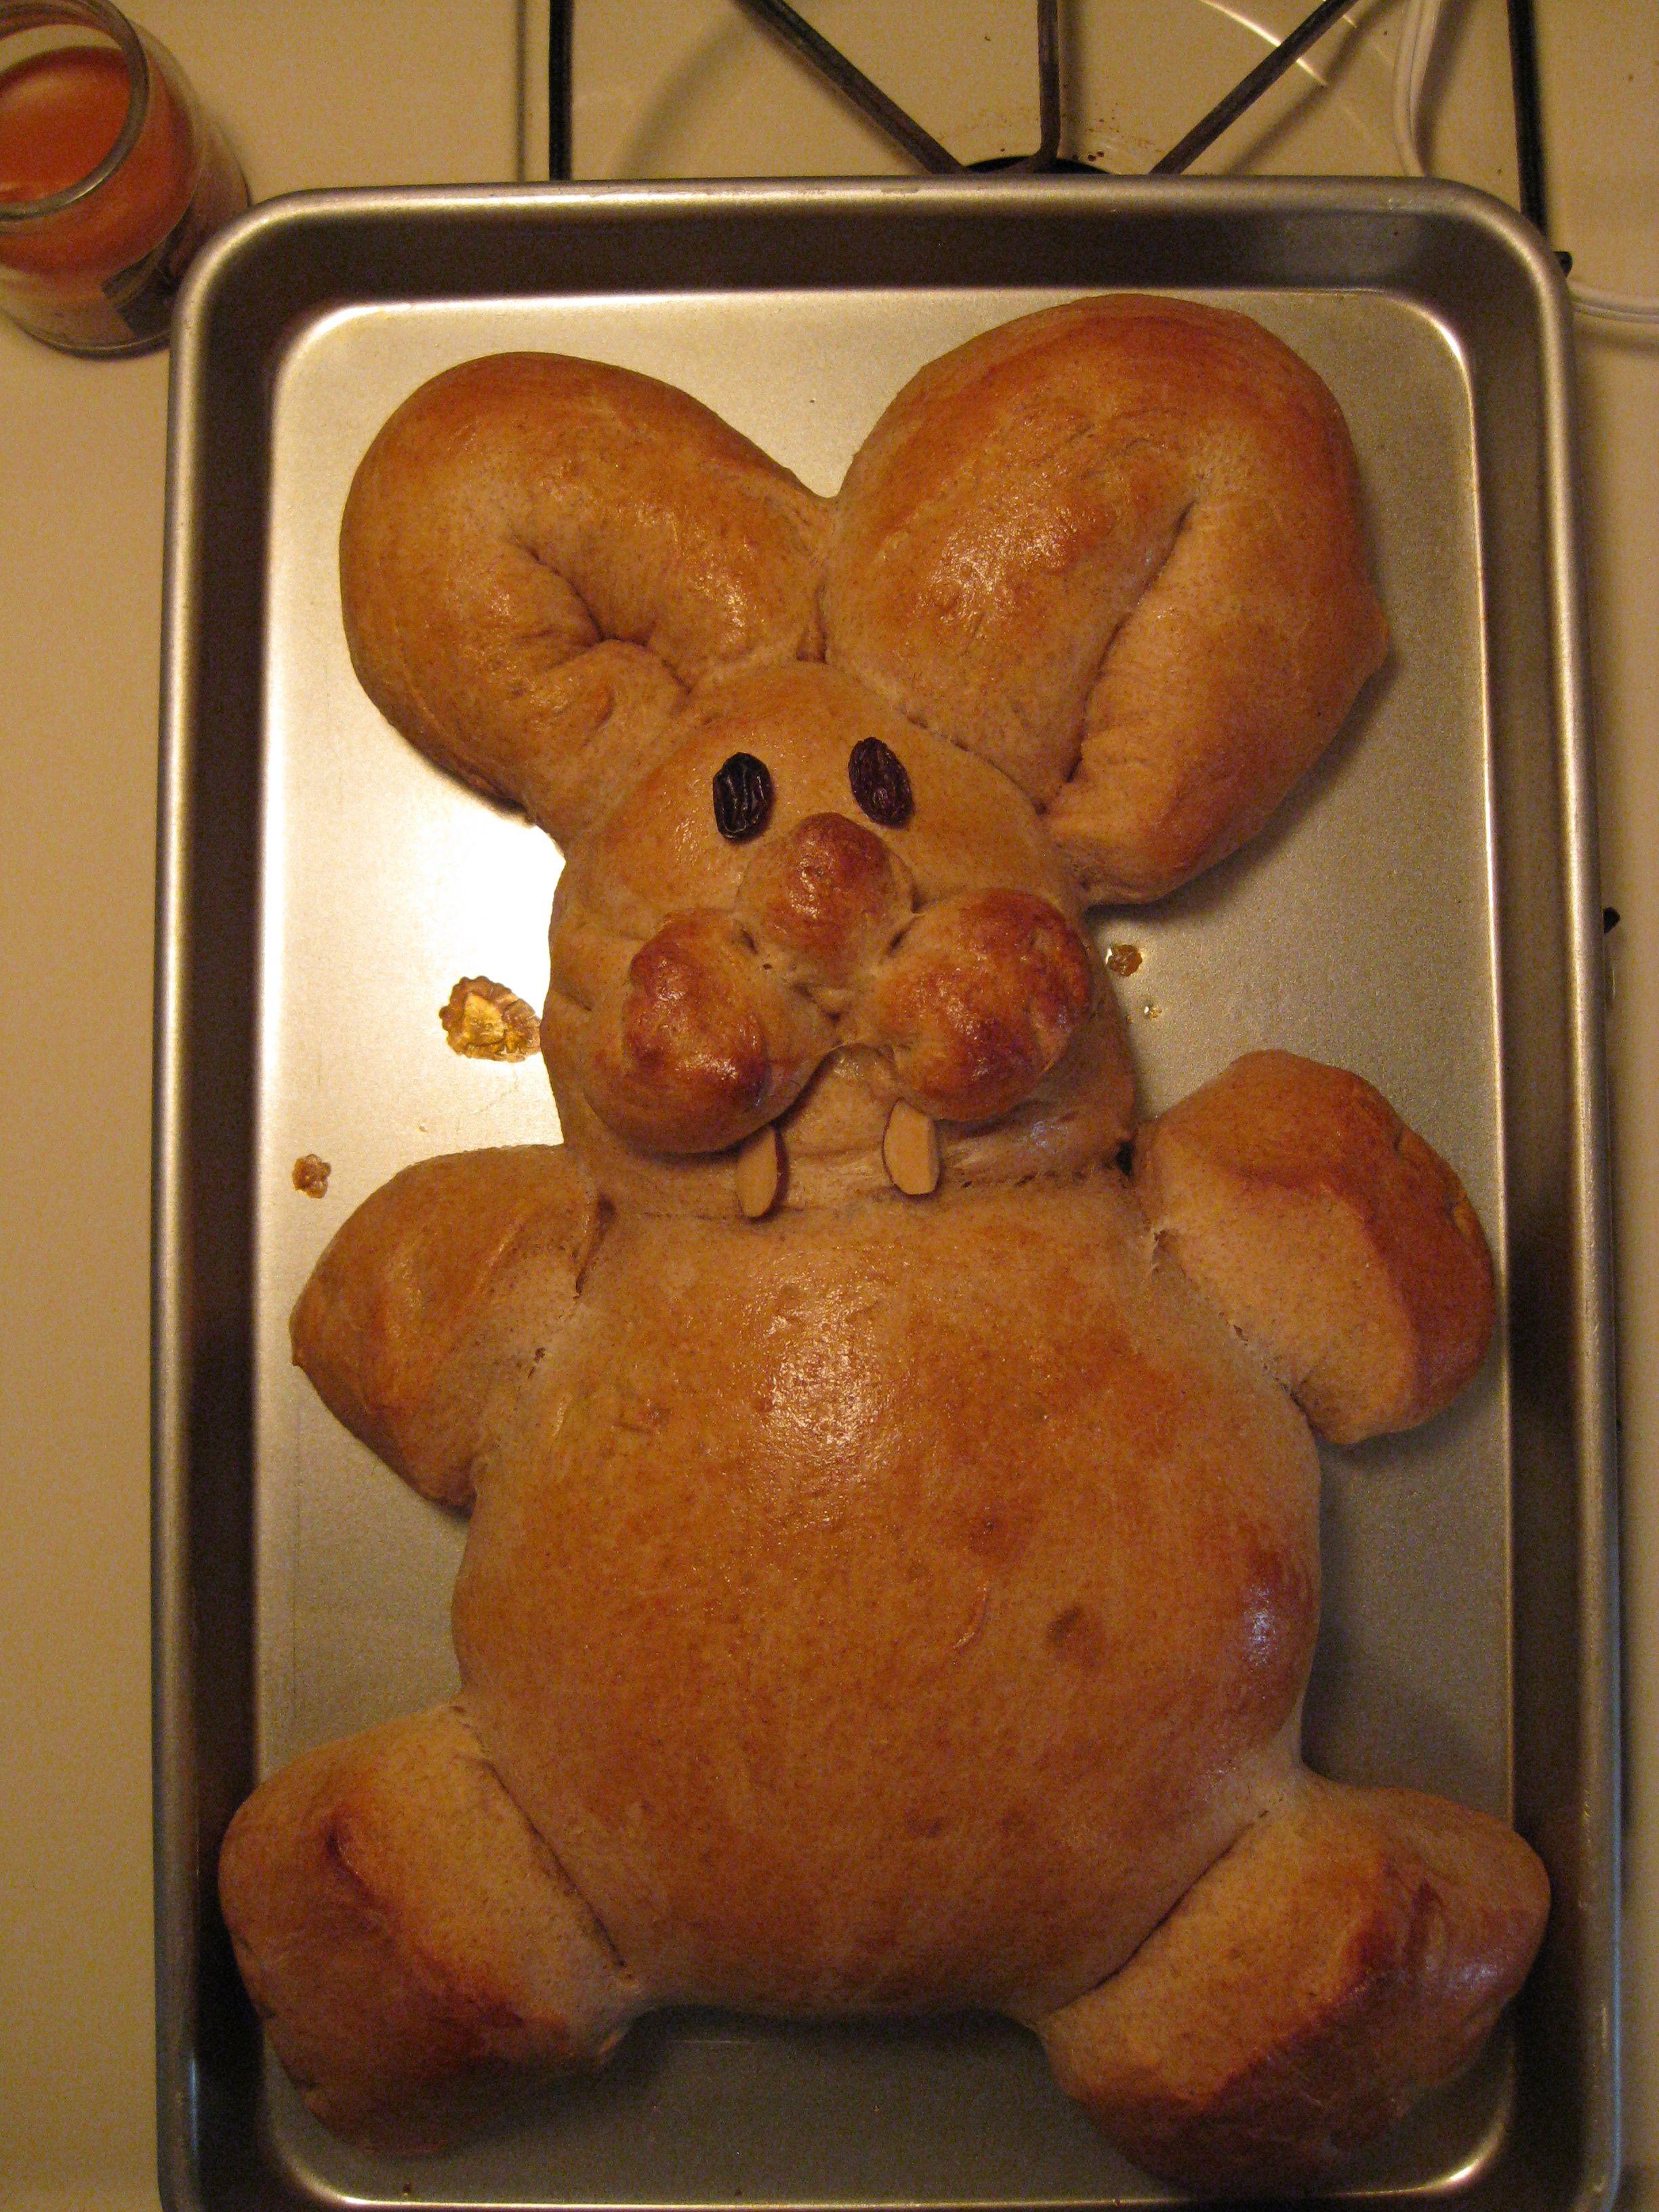 Easter Bunny bread | Recipes | Pinterest